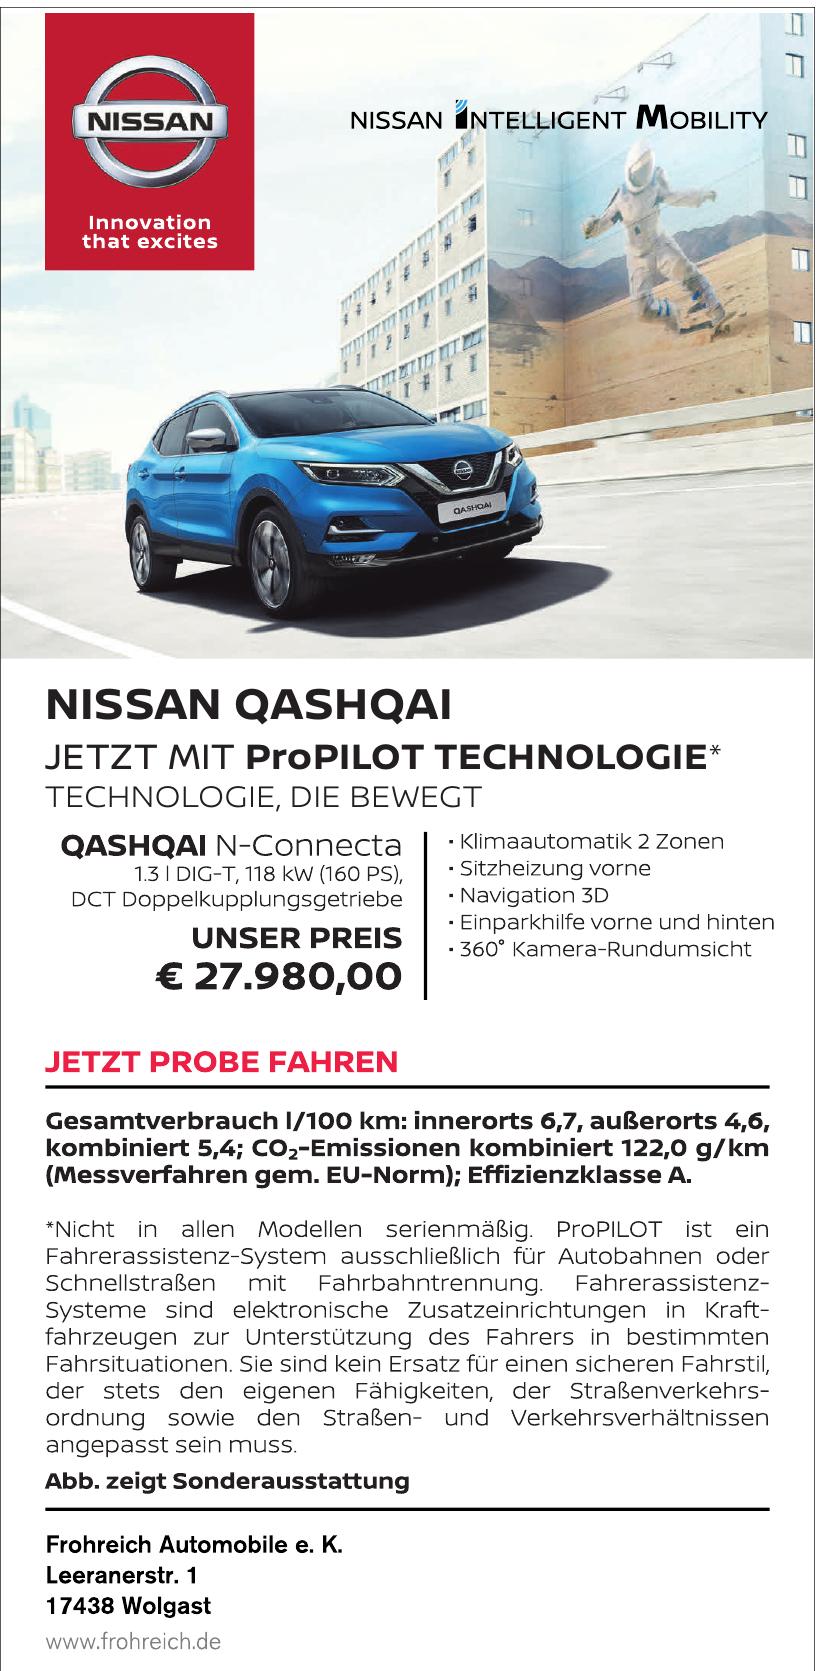 Frohreich Automobile e. K.